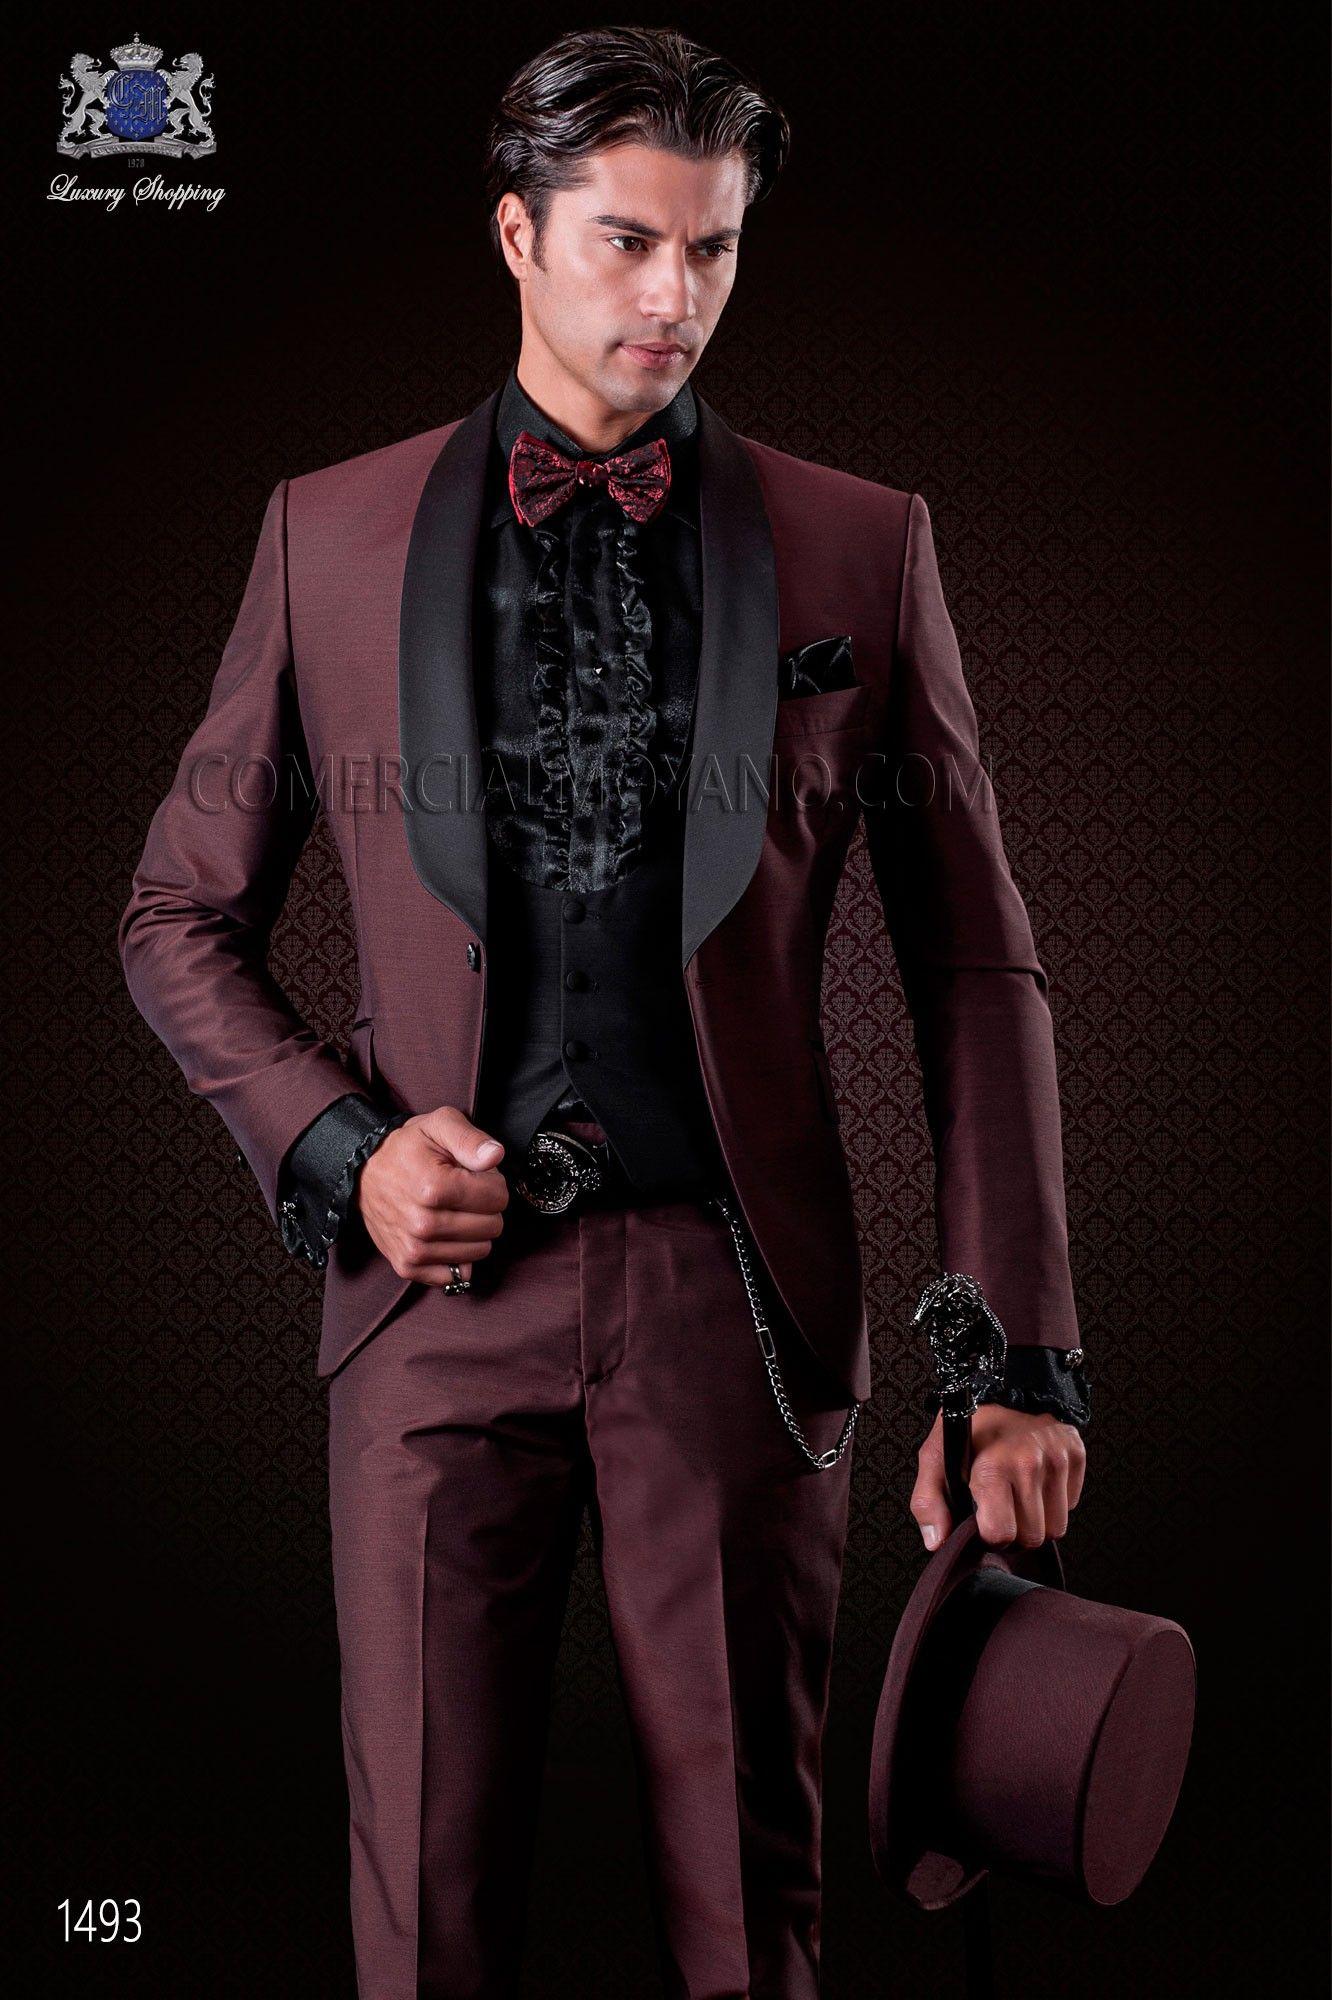 grenat mode costume de mari tuxedo ottavio nuccio gala costume mariage chaussure mariage et. Black Bedroom Furniture Sets. Home Design Ideas